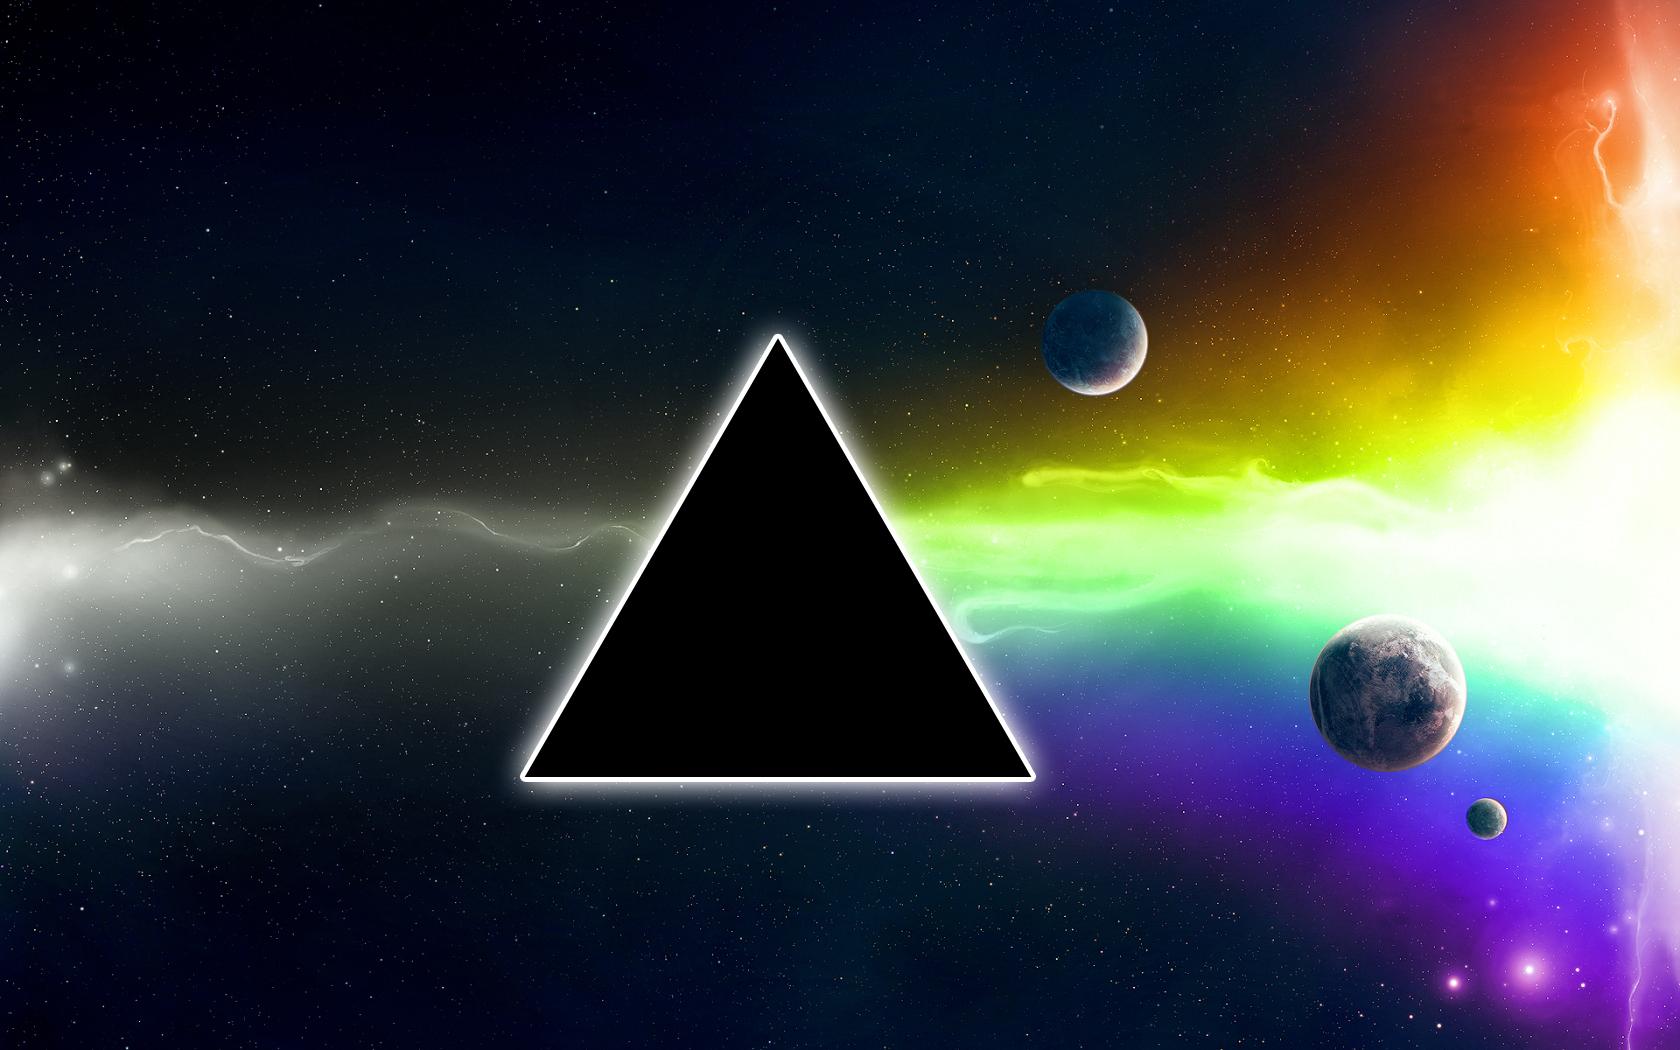 Pink Floyd pink floyd 10566709 1680 1050jpg 1680x1050